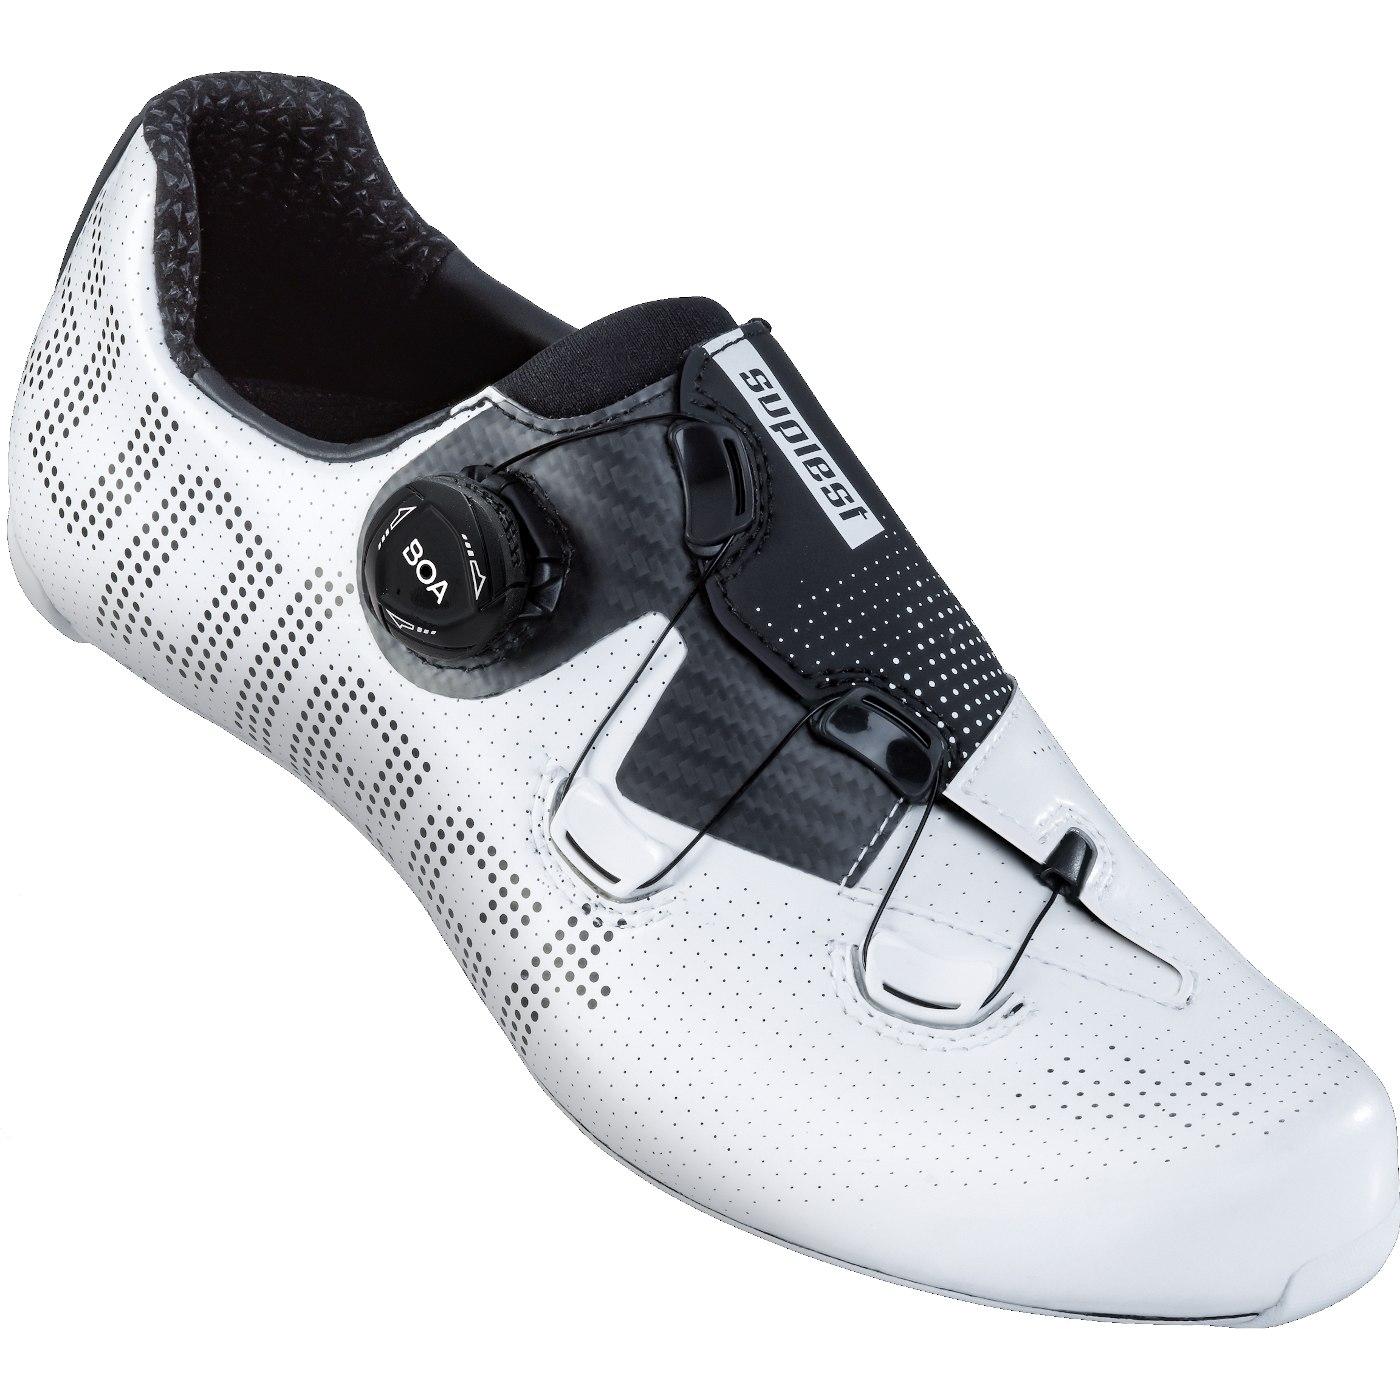 Image of Suplest EDGE+ BOA IP1 Road Performance Road Shoe - White / Black 01.064.